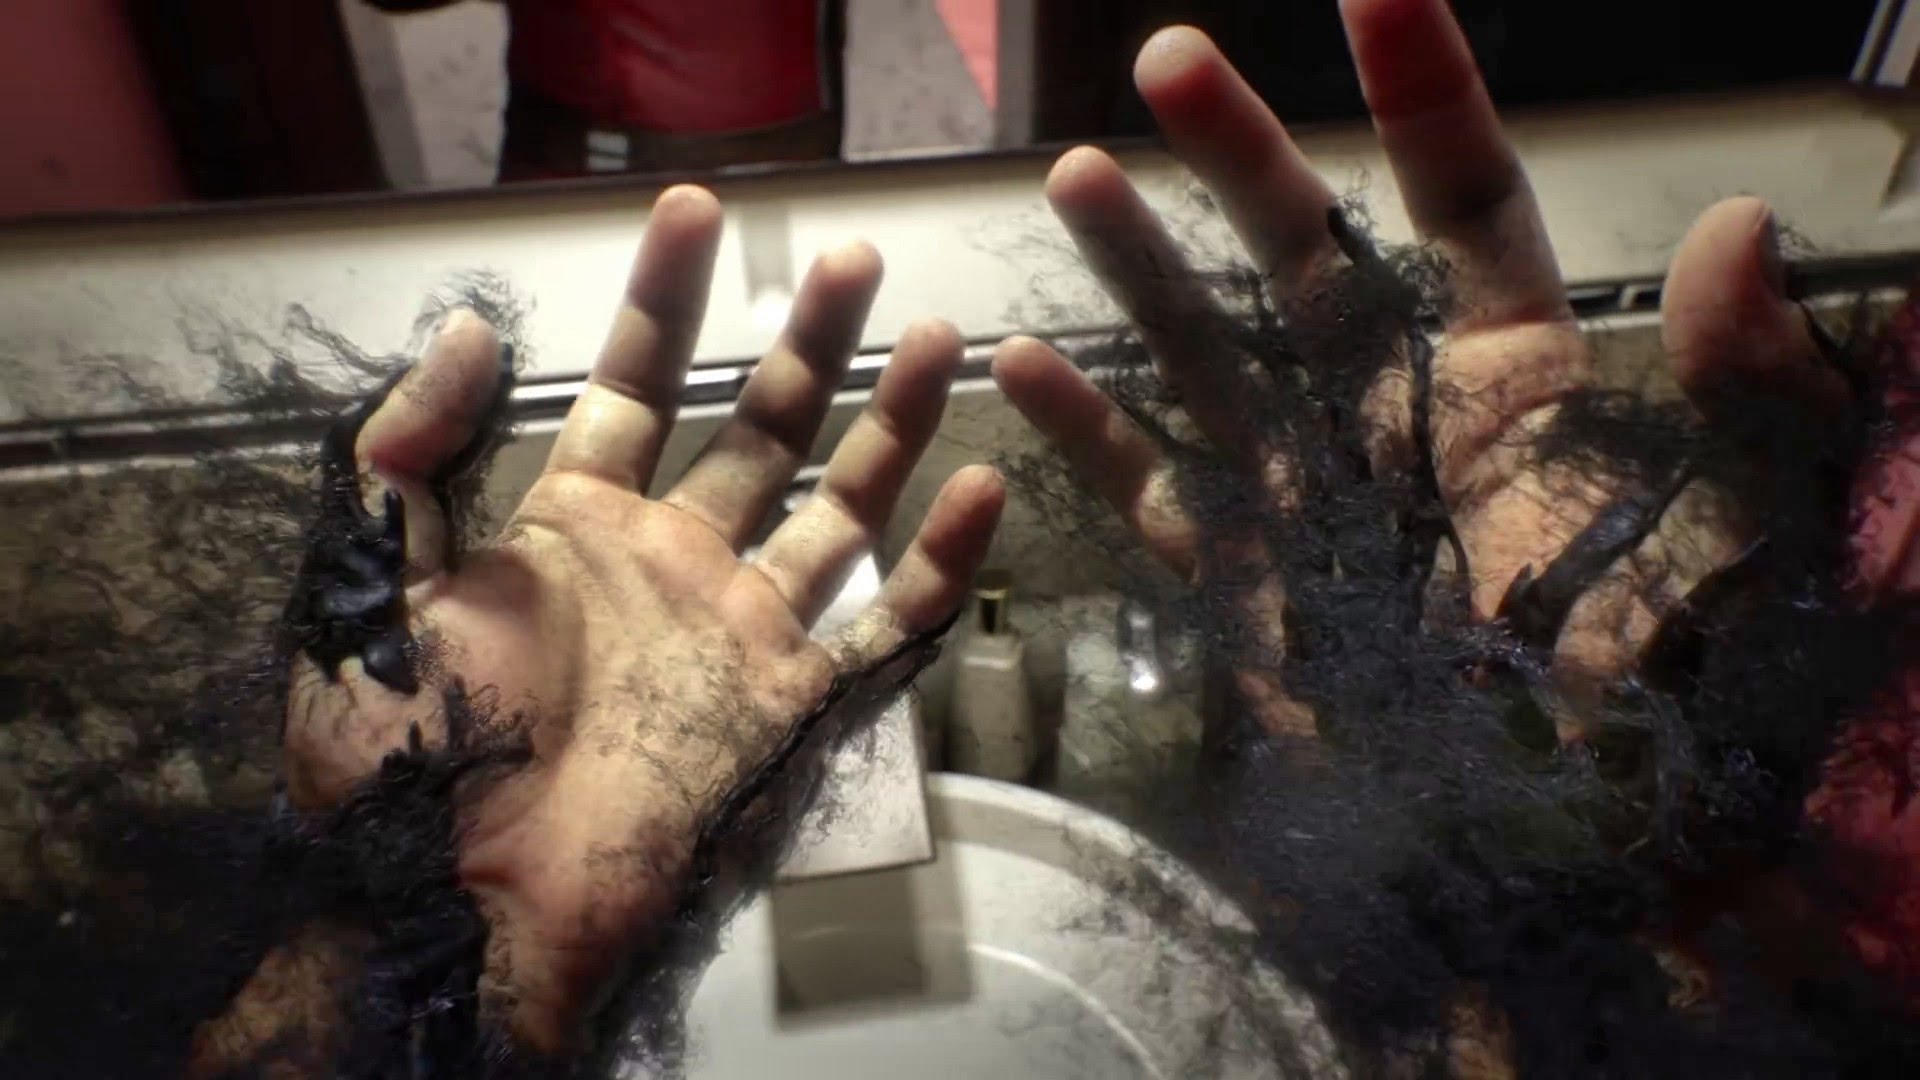 ¡Espectacular gameplay de Prey! #Gamescom